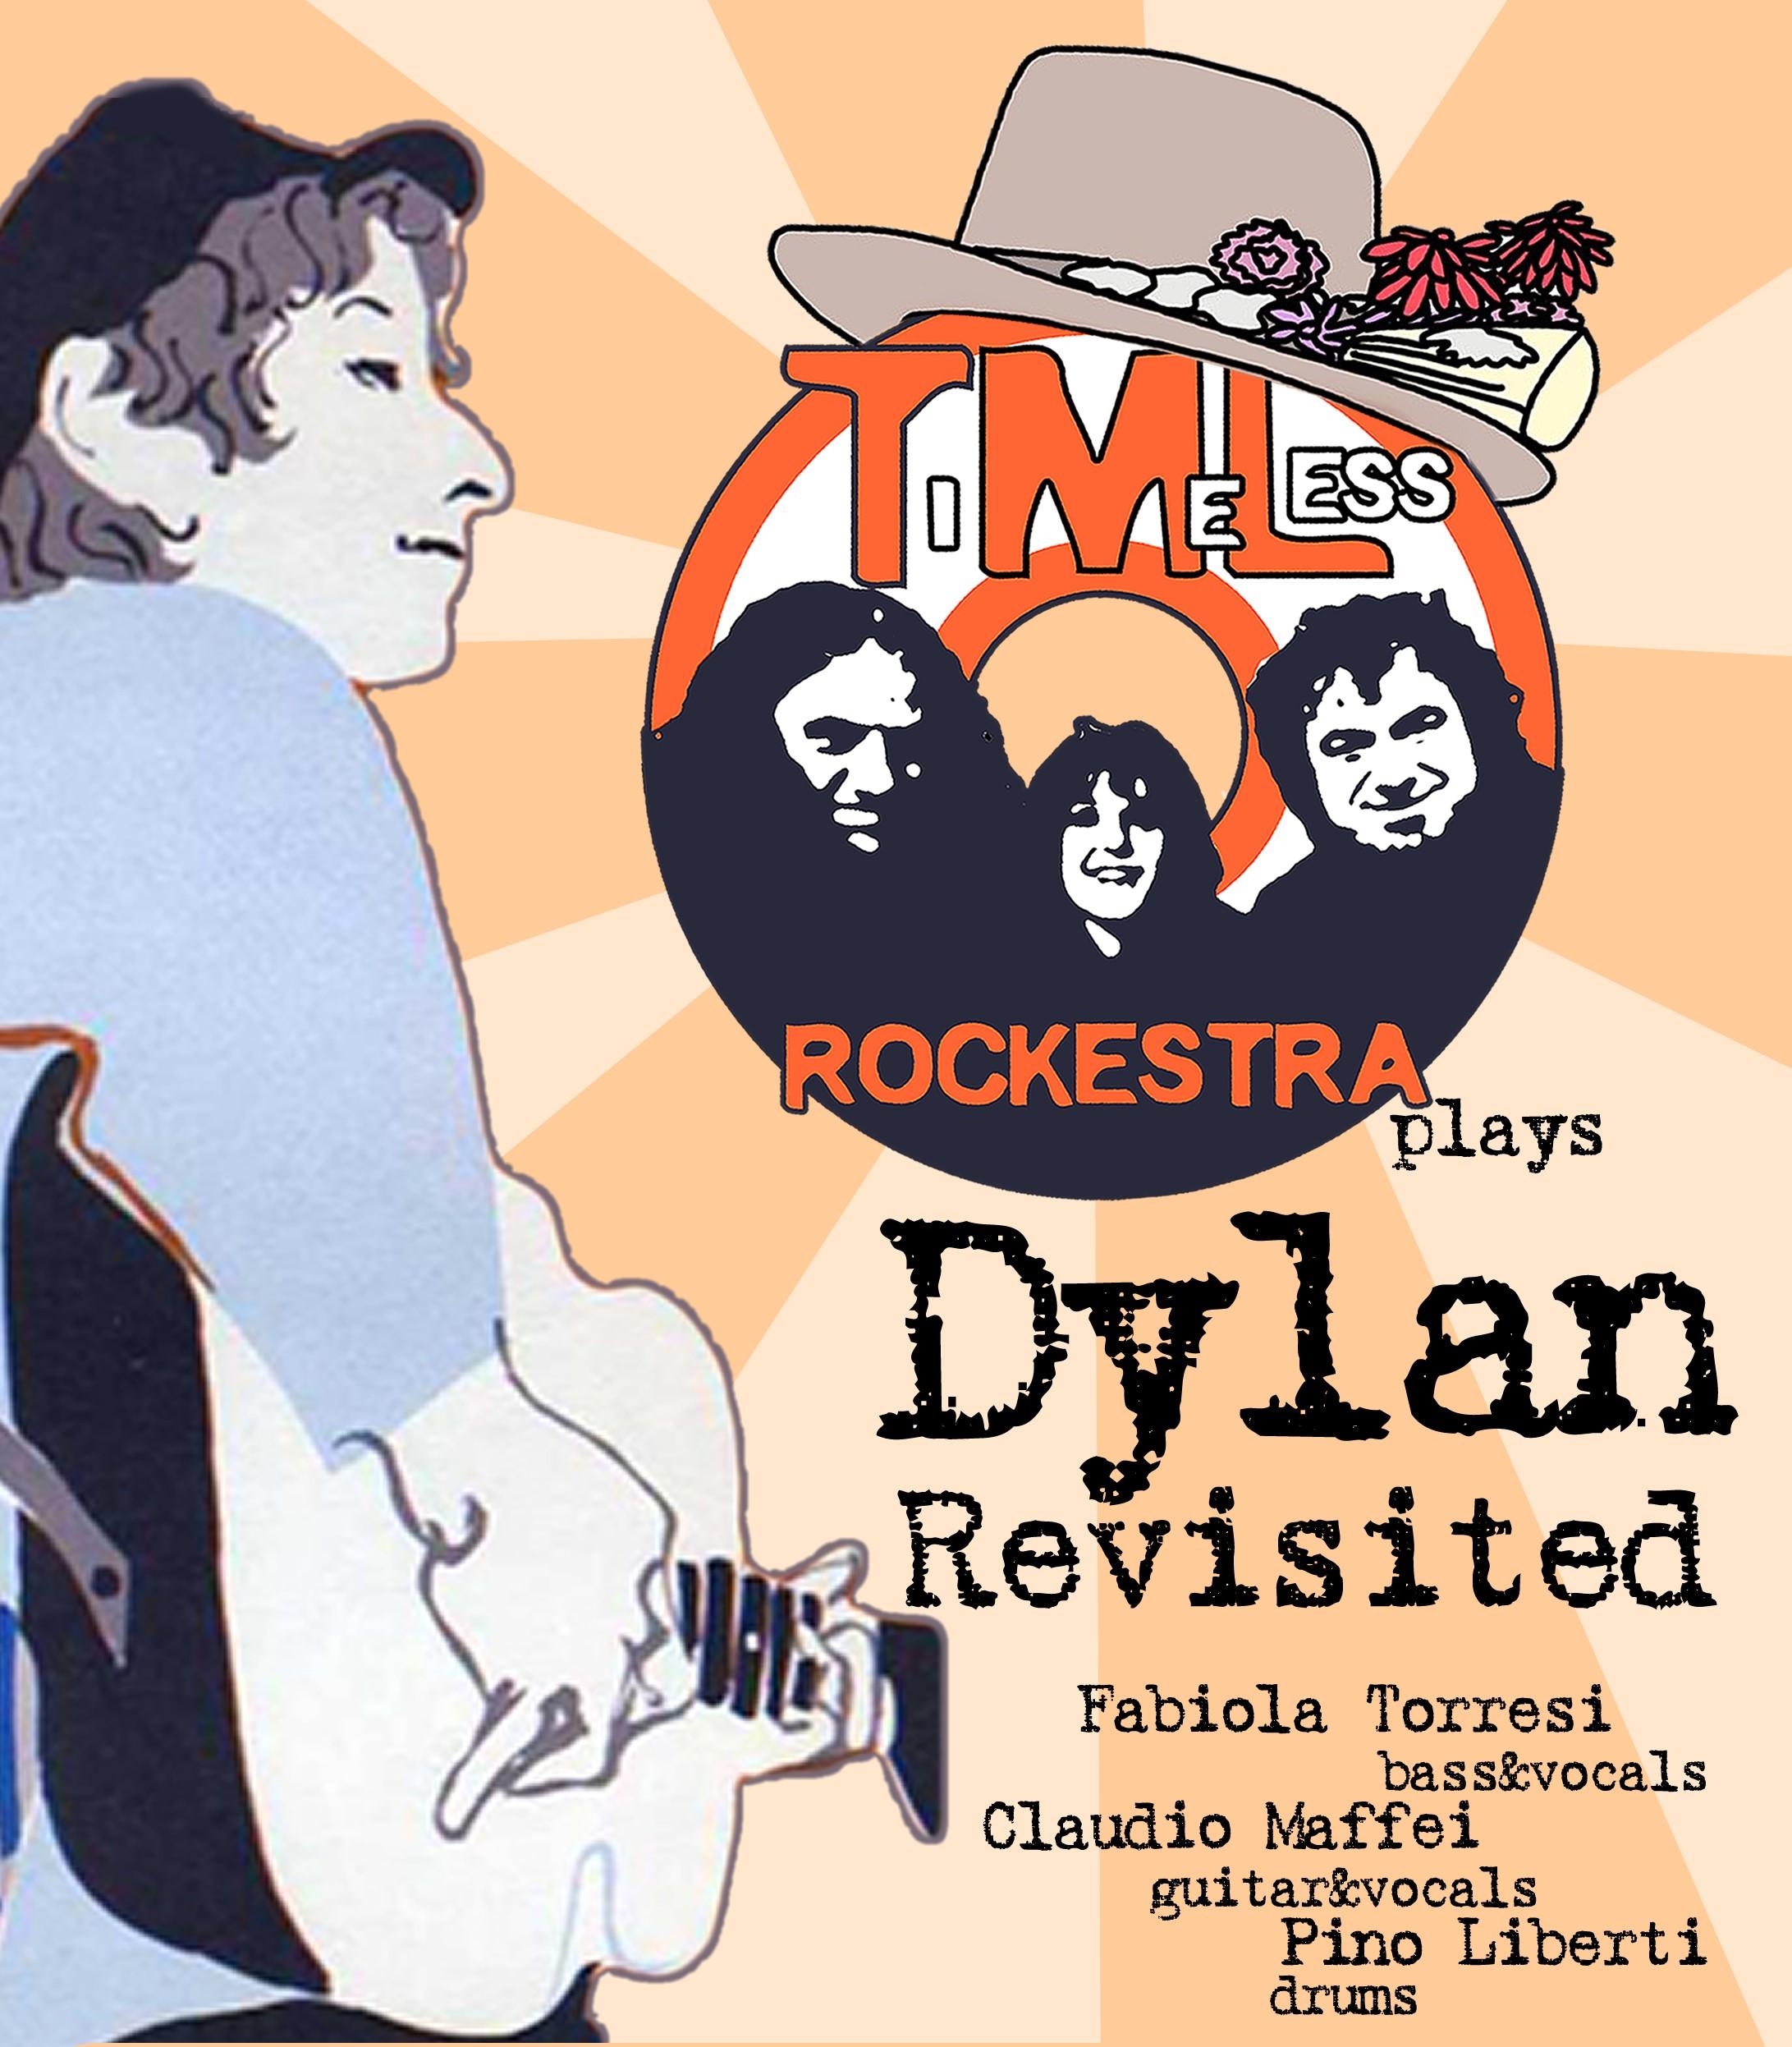 Dylan claudio maffei jazzbluesfactory JBF